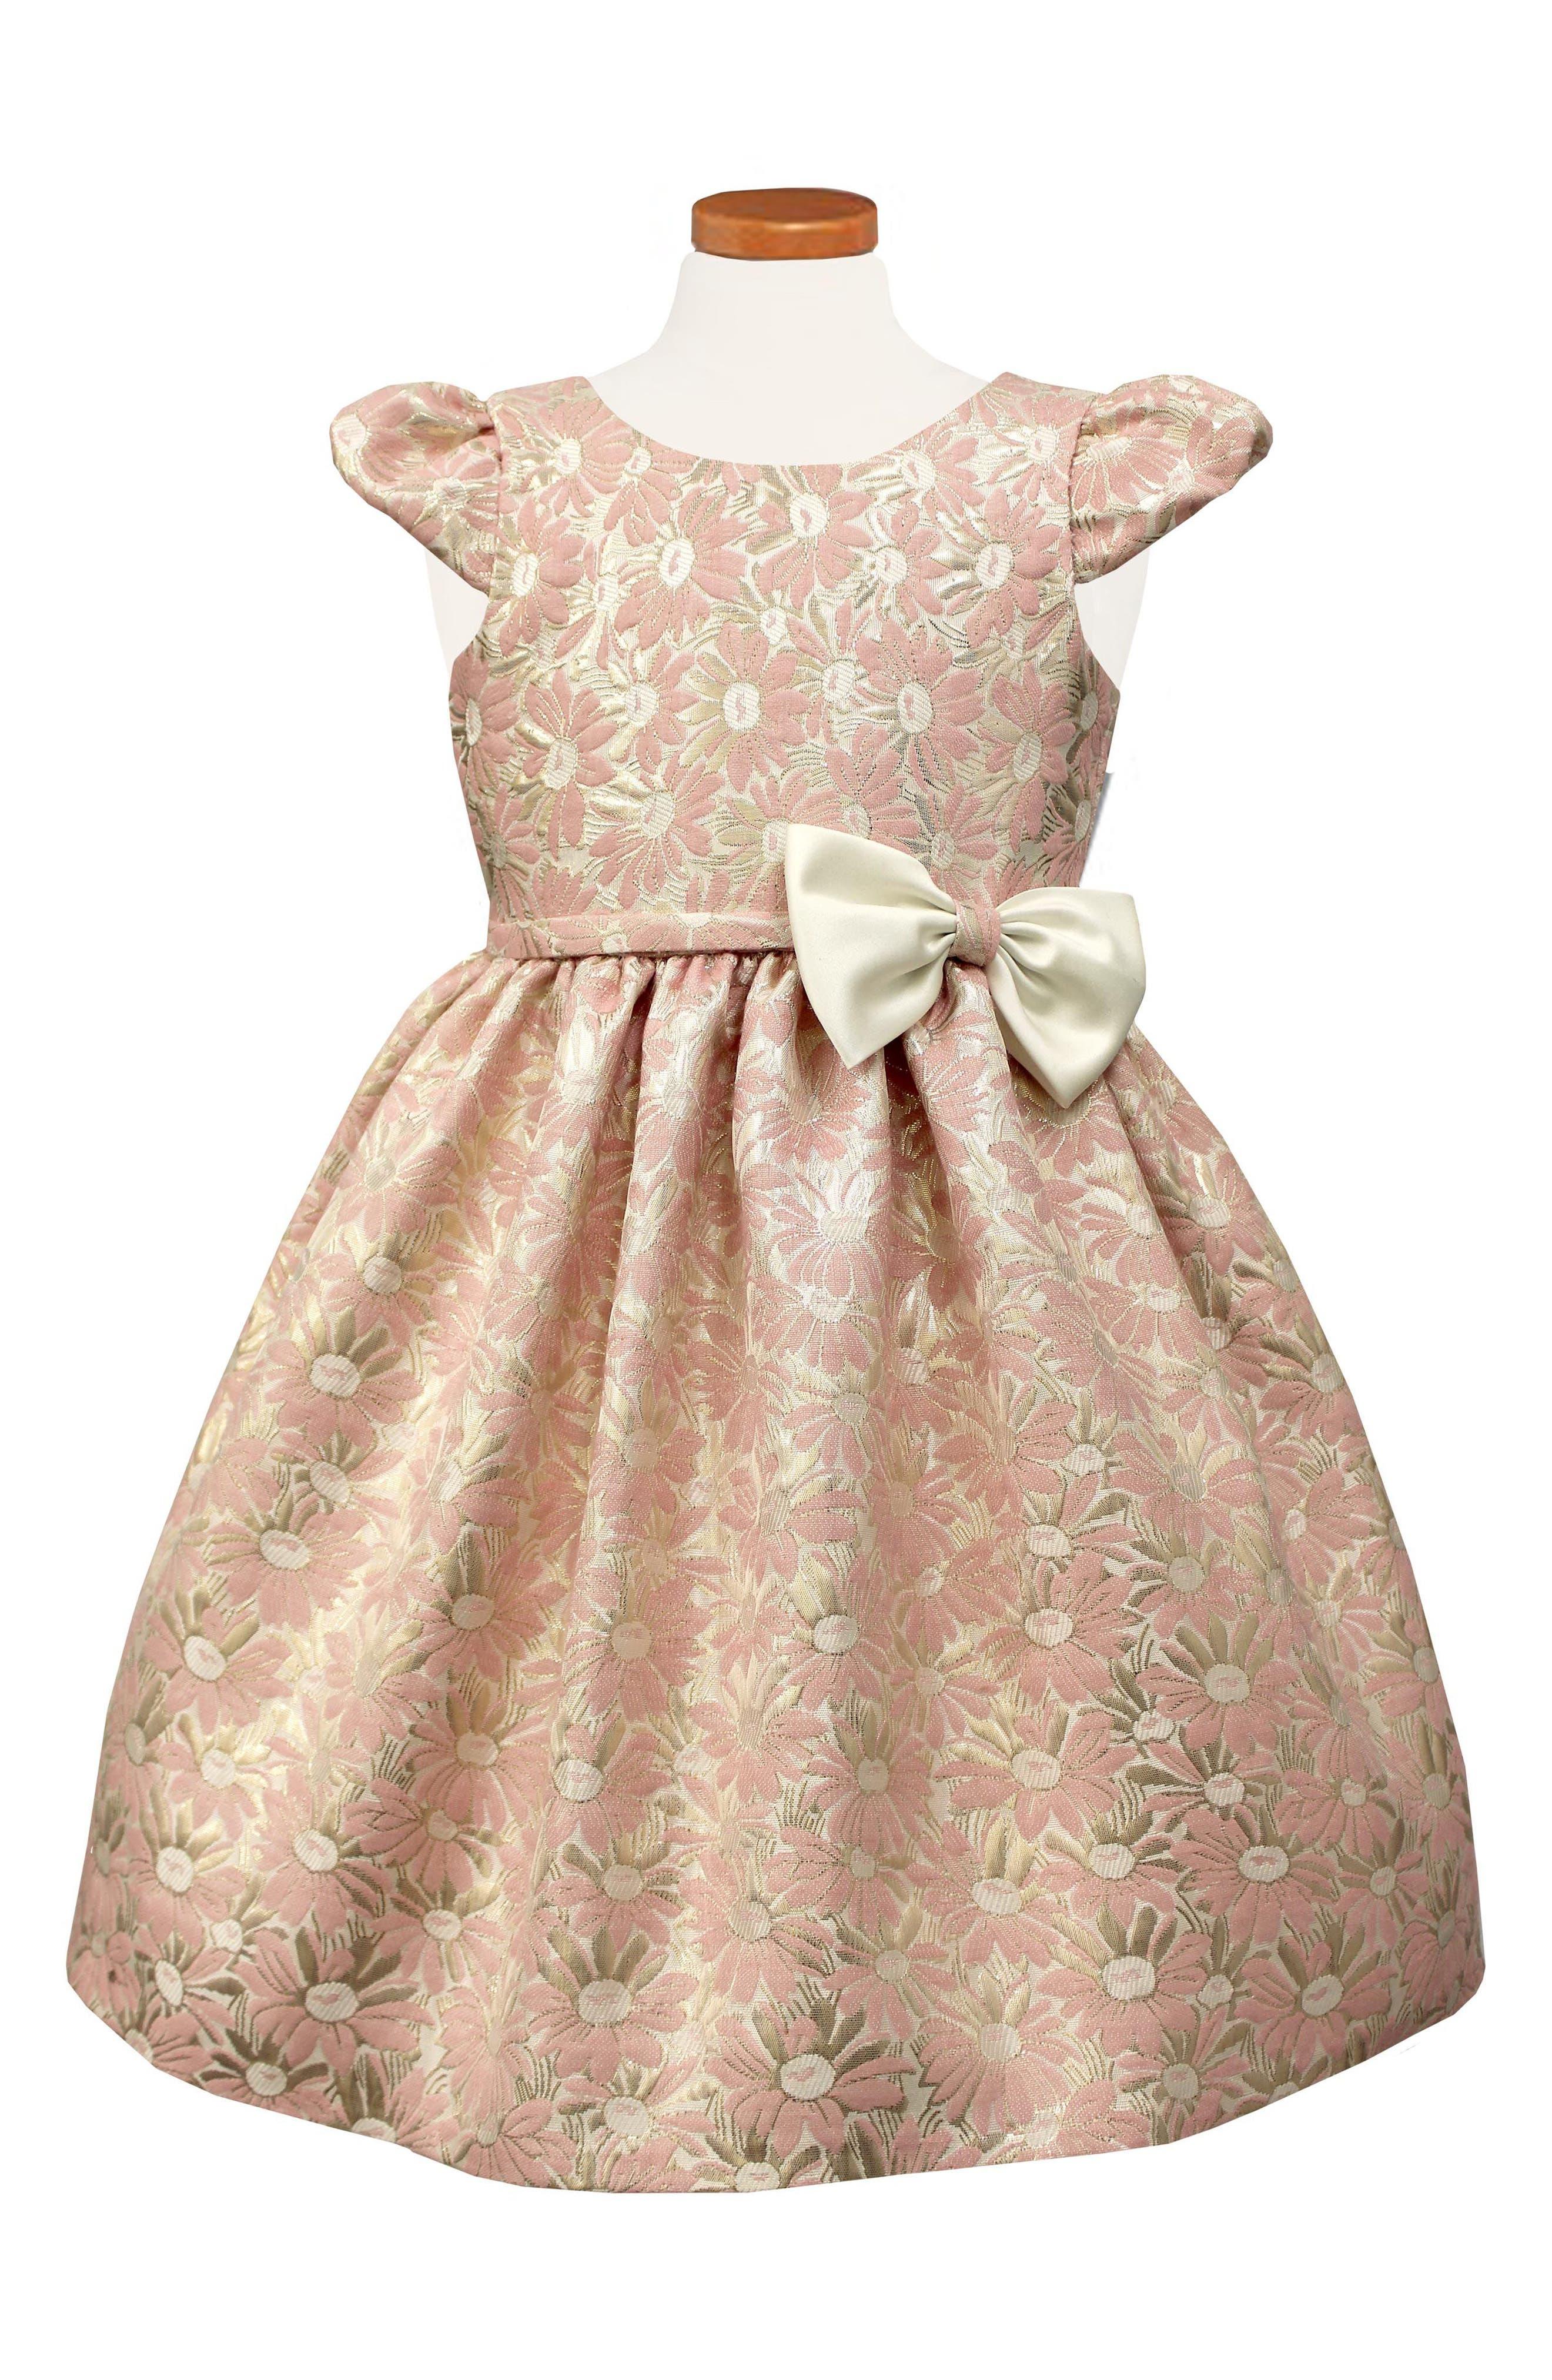 Main Image - Sorbet Floral Jacquard Cap Sleeve Dress (Toddler Girls & Little Girls)